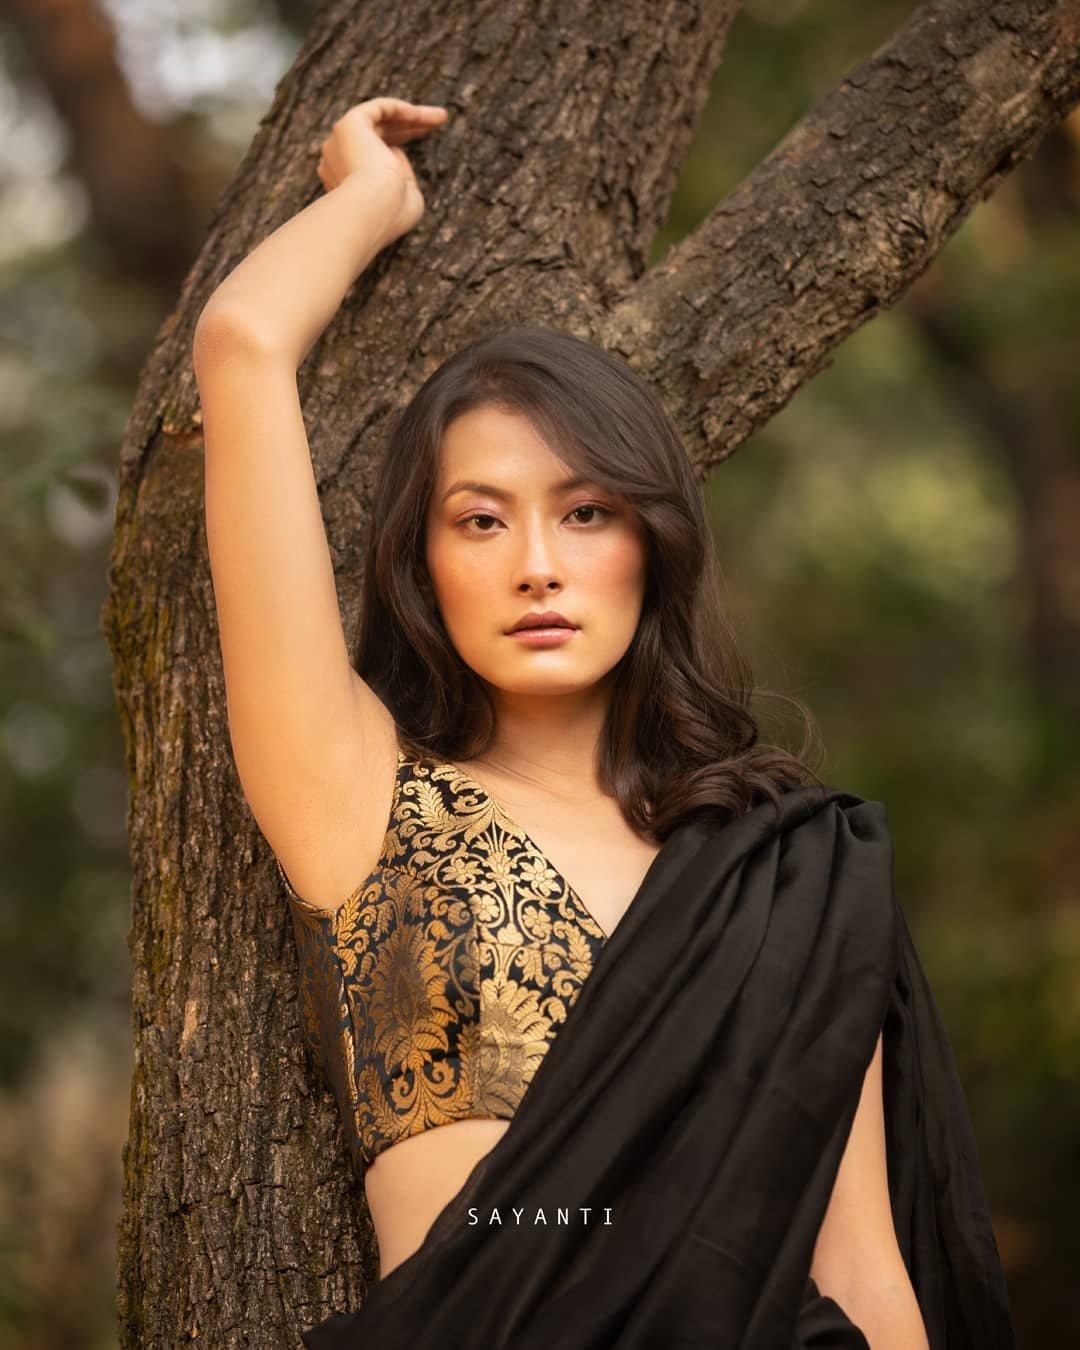 Black brocade blouse-sayanti ghosh-1